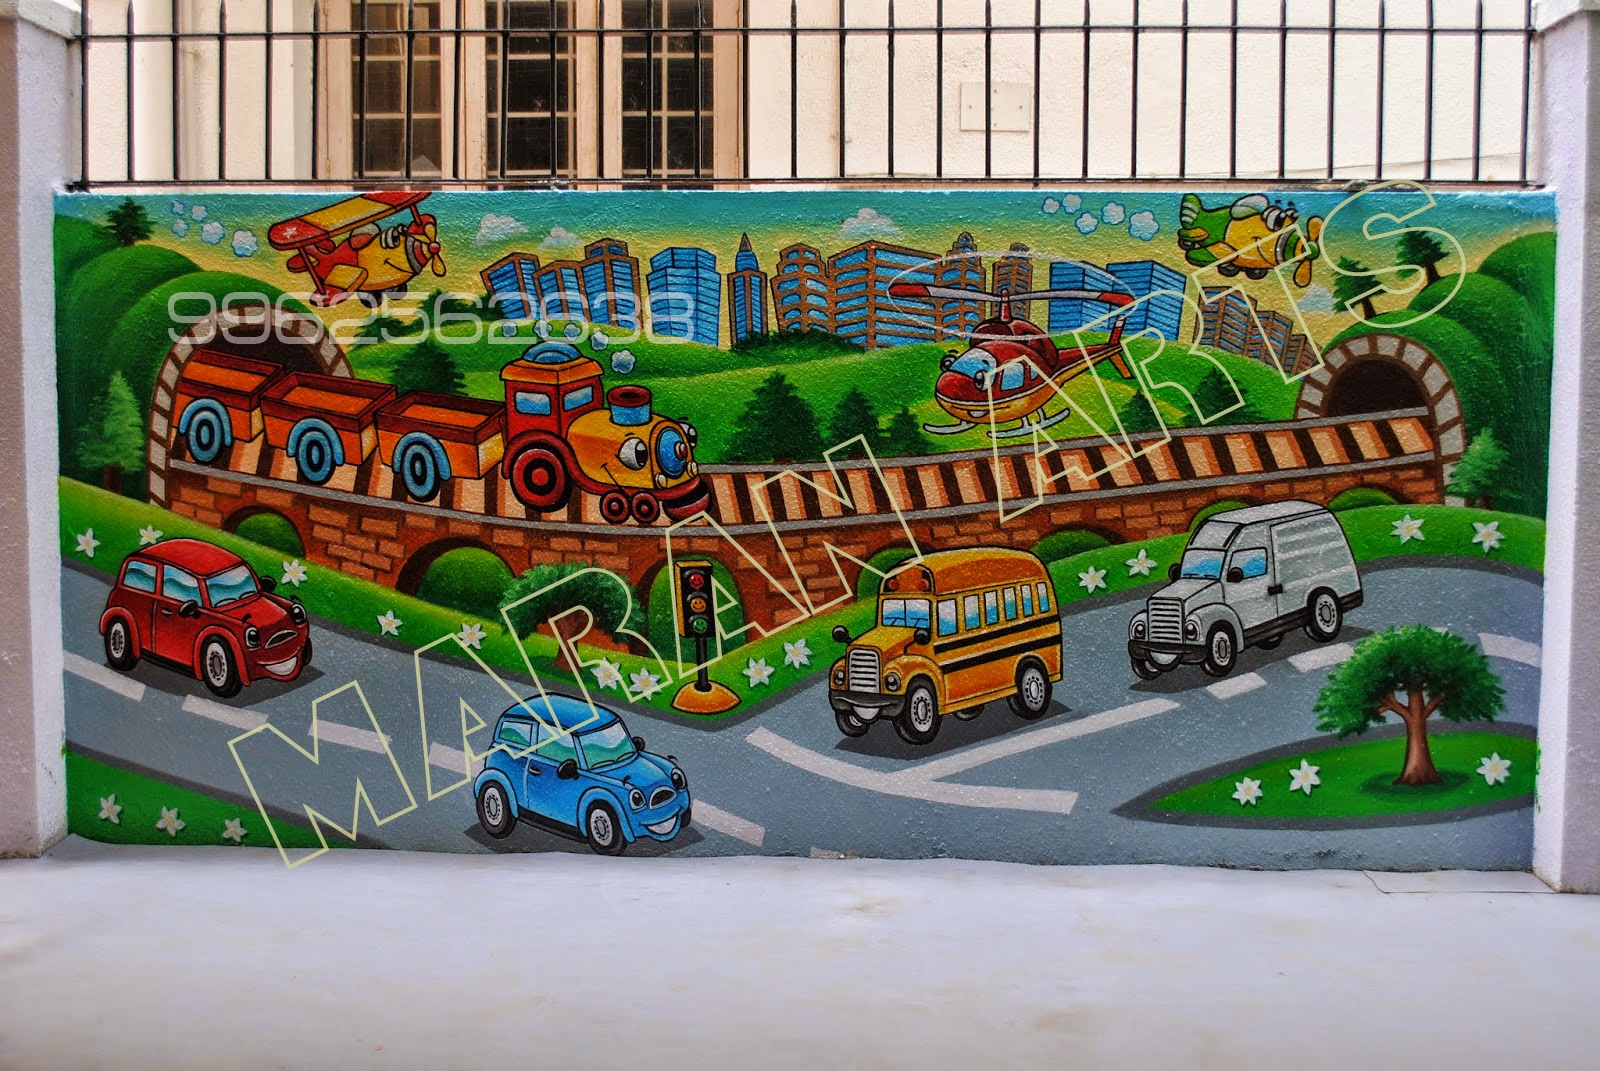 Cartoon Wall Art For Kids With Play School Wall Murals   ( Maran Arts    9962562638 ) Part 89